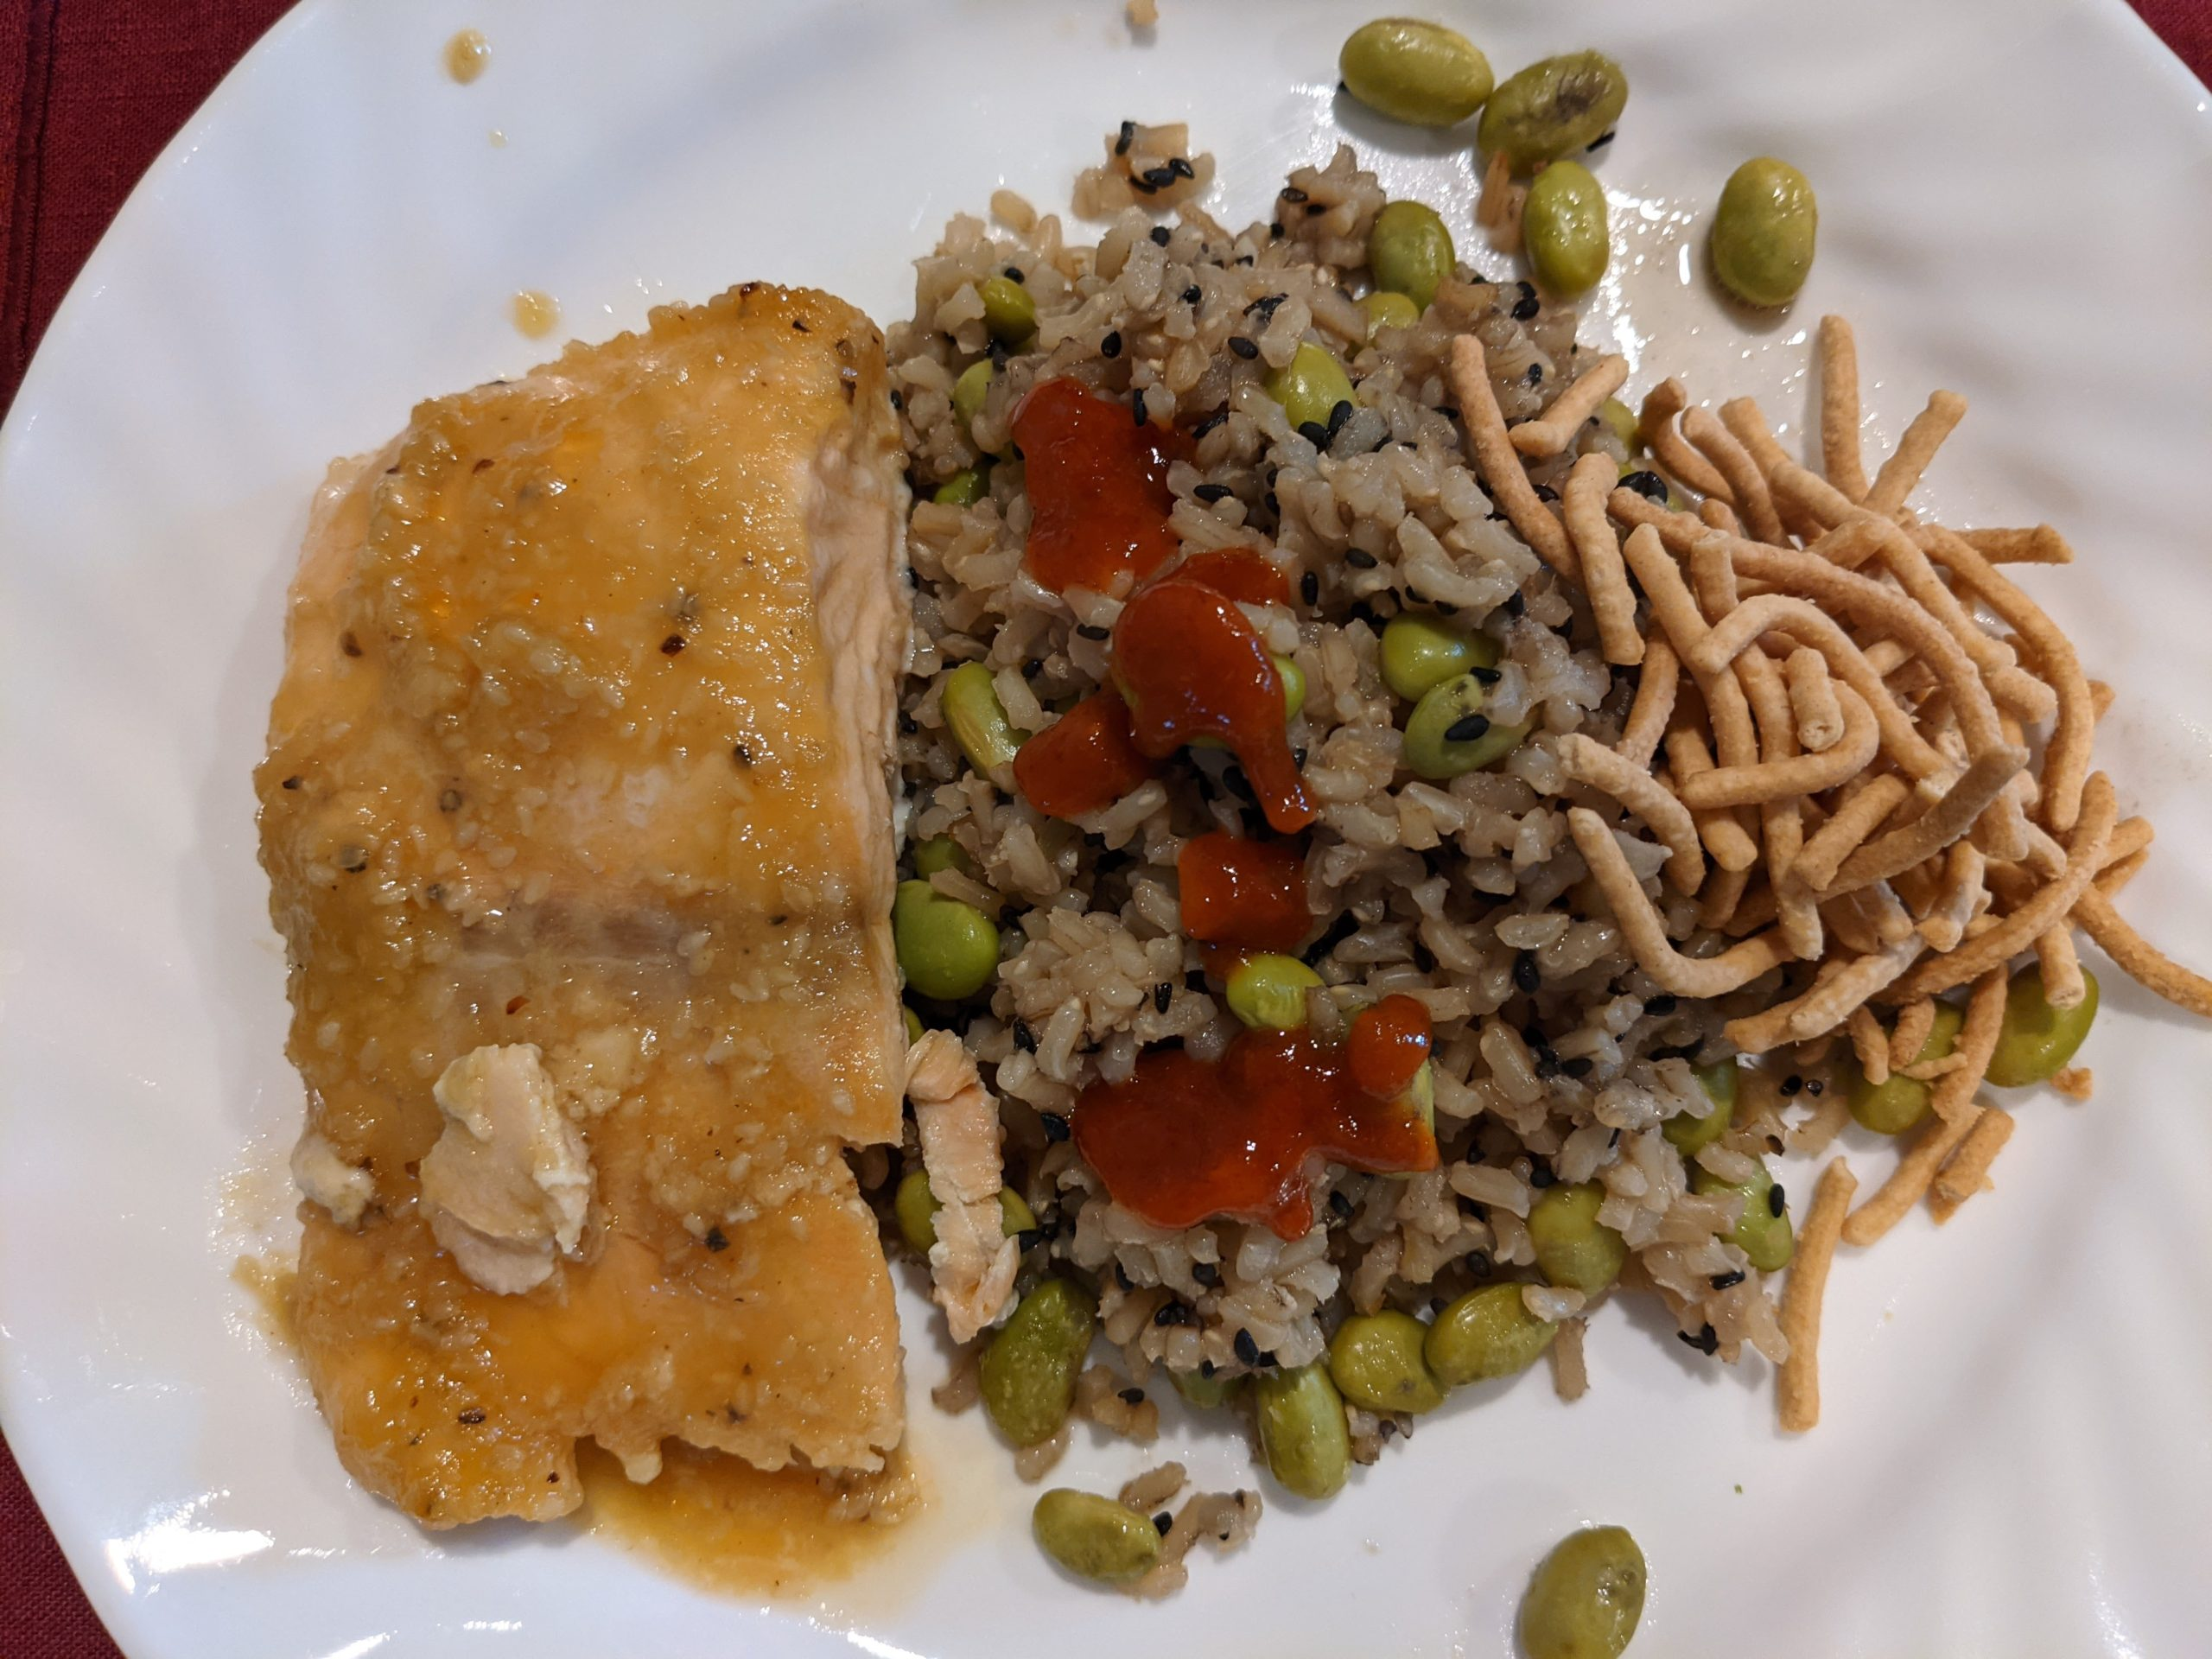 Header photo of salmon dish